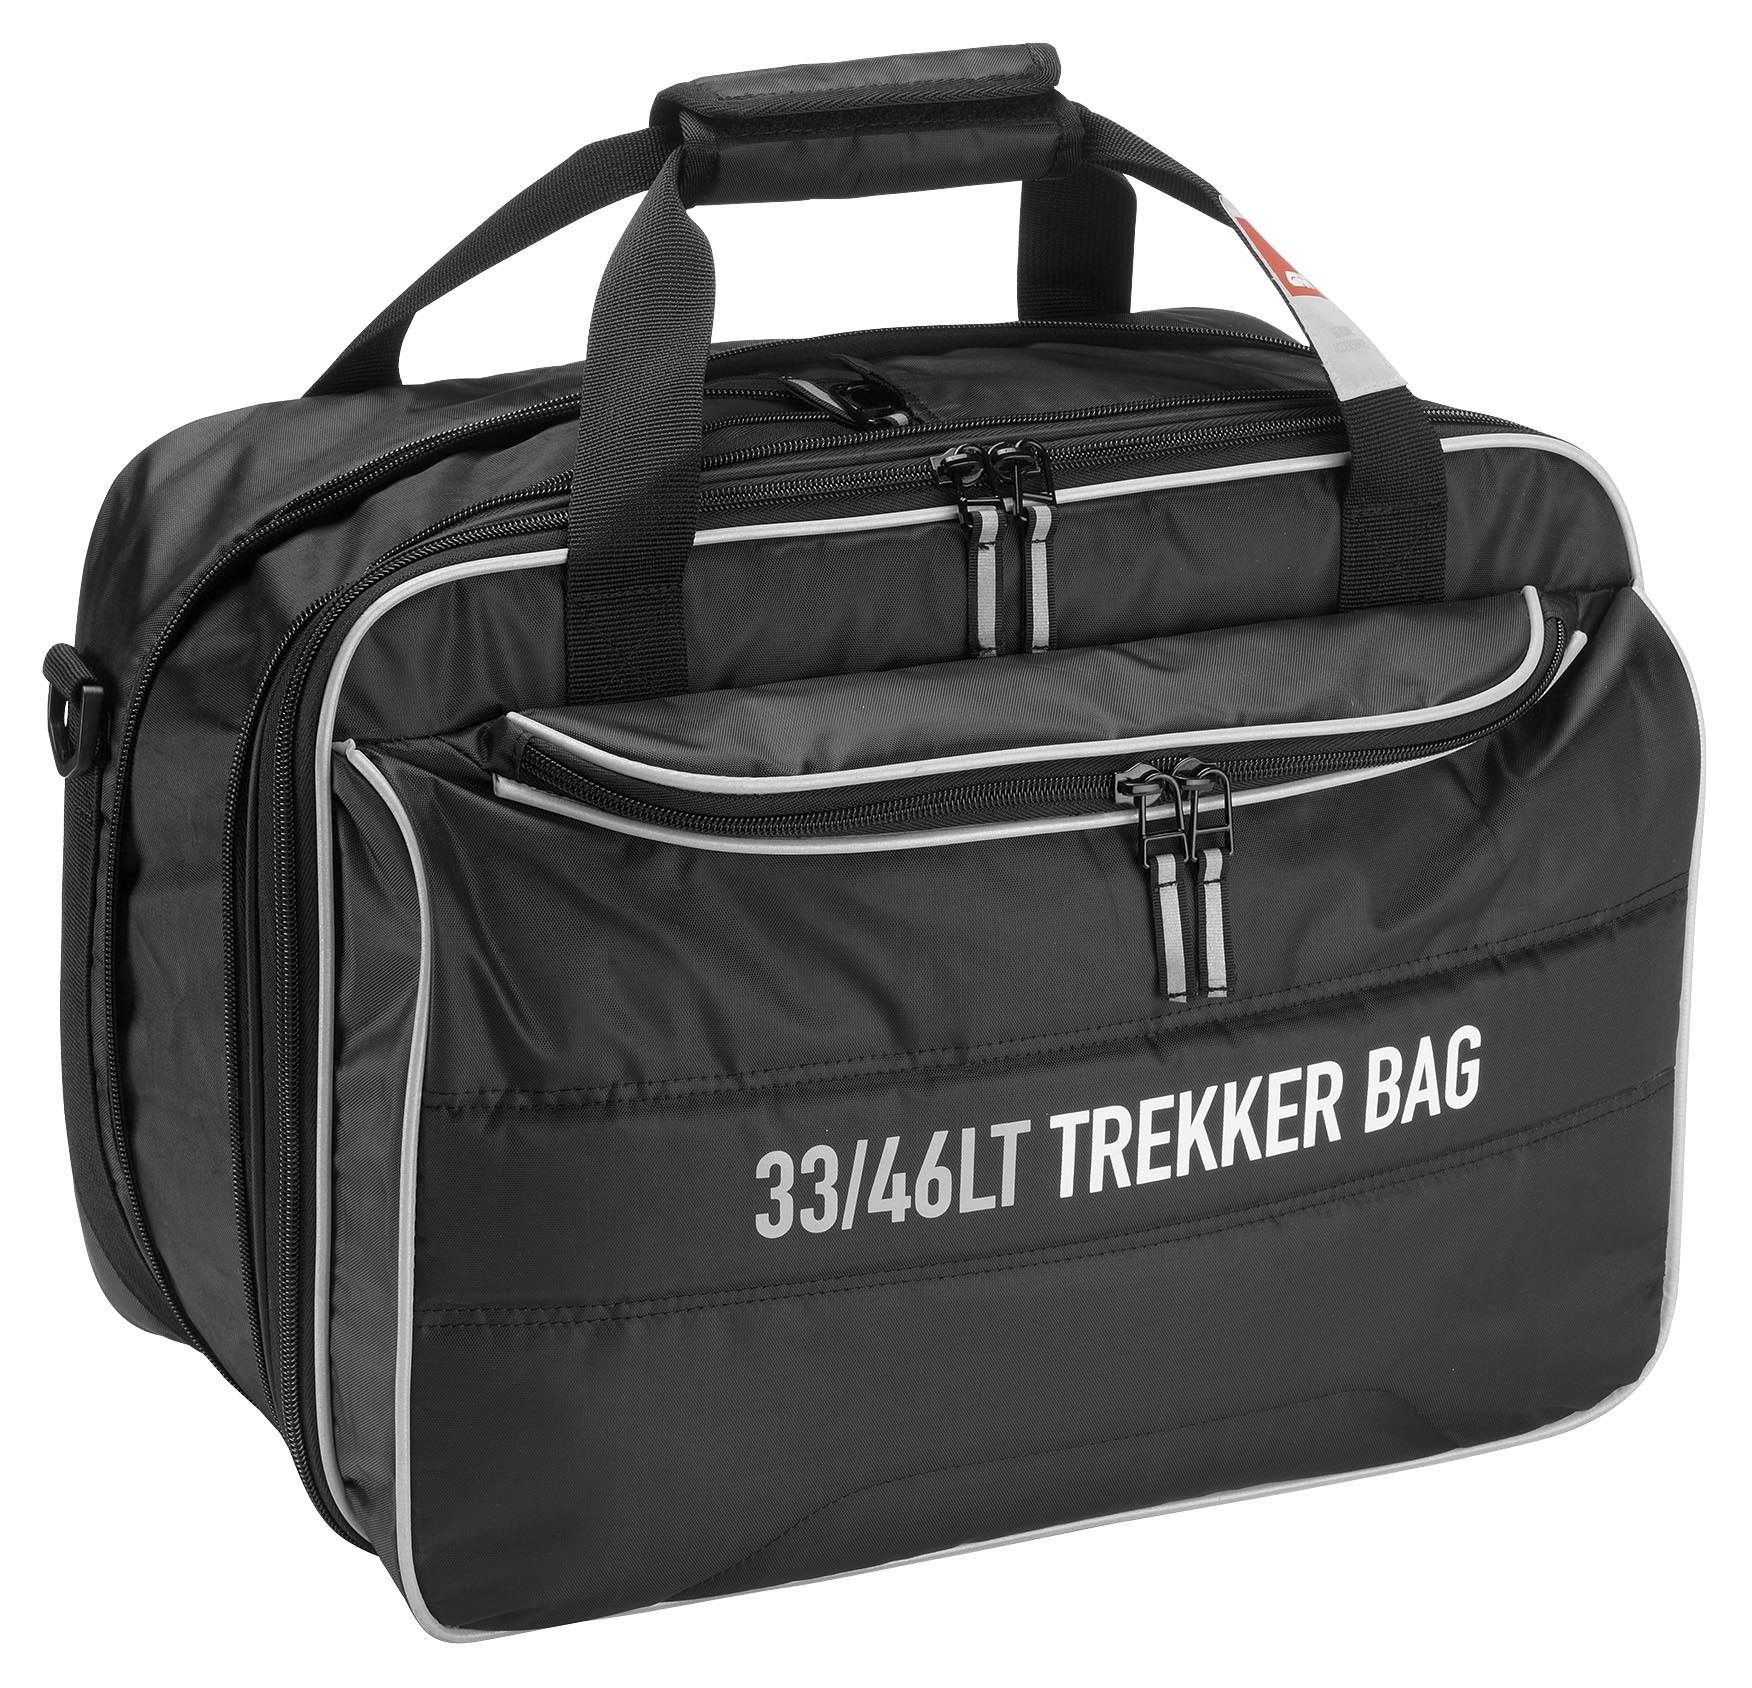 Givi T484 Trekker Top Case Internal Bag - RevZilla